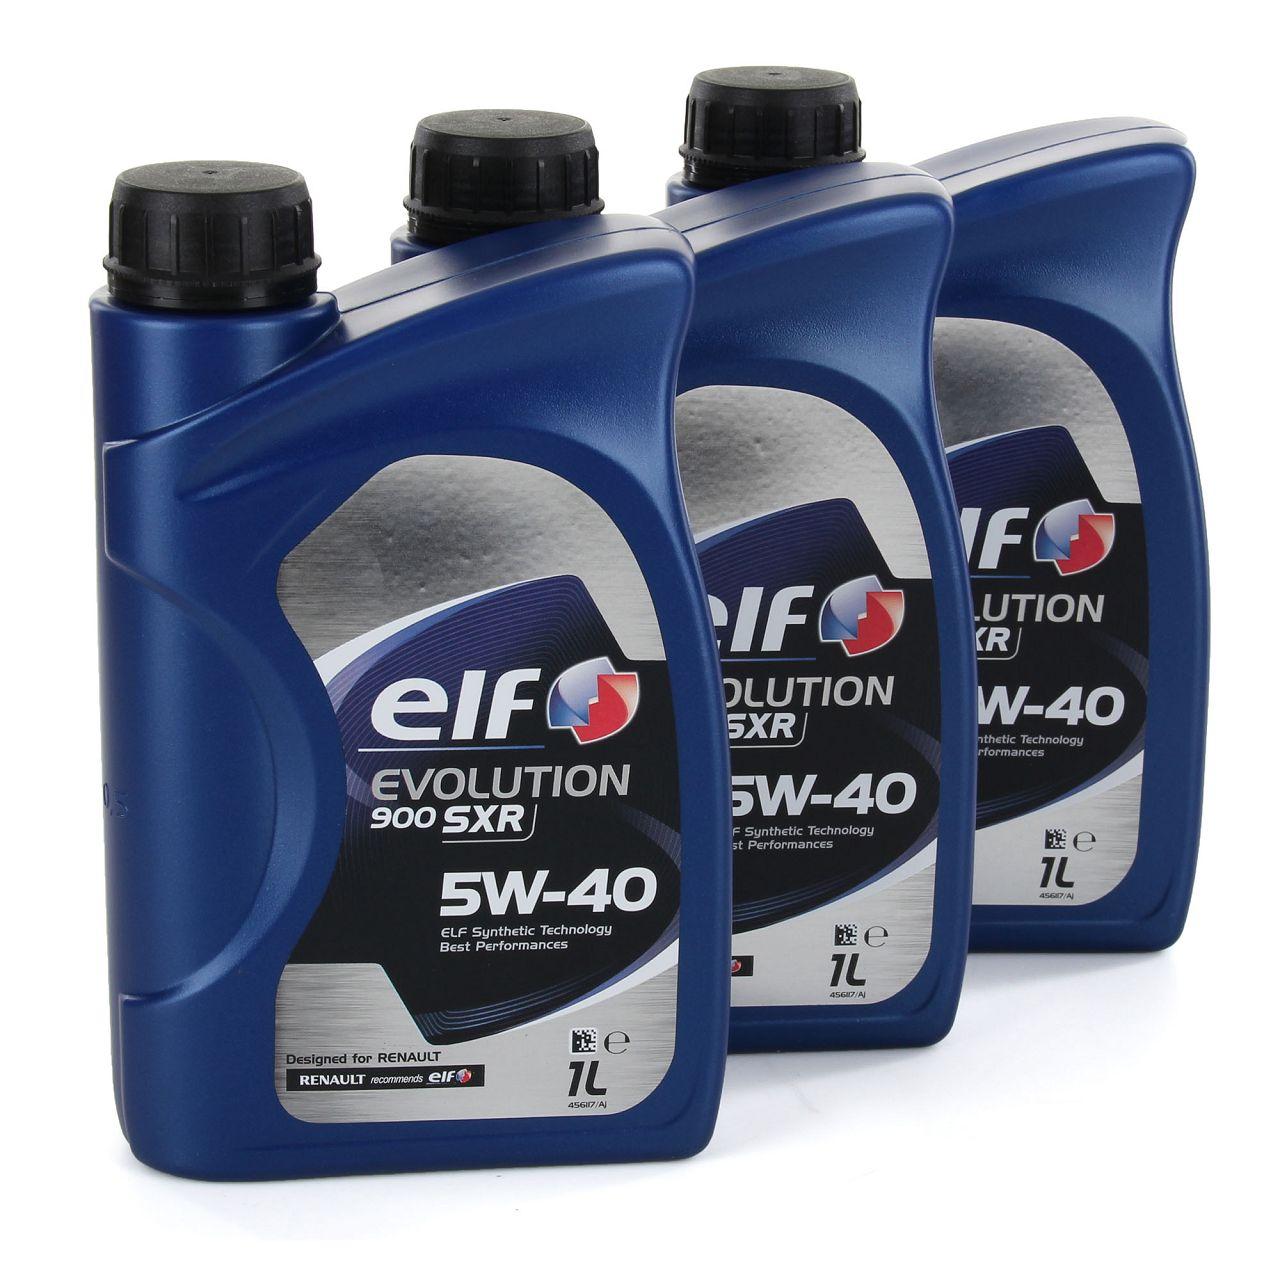 elf Evolution 900 SXR 5W-40 Motoröl RN0700 RN0710 MERCEDES 226.5 - 3L 3 Liter